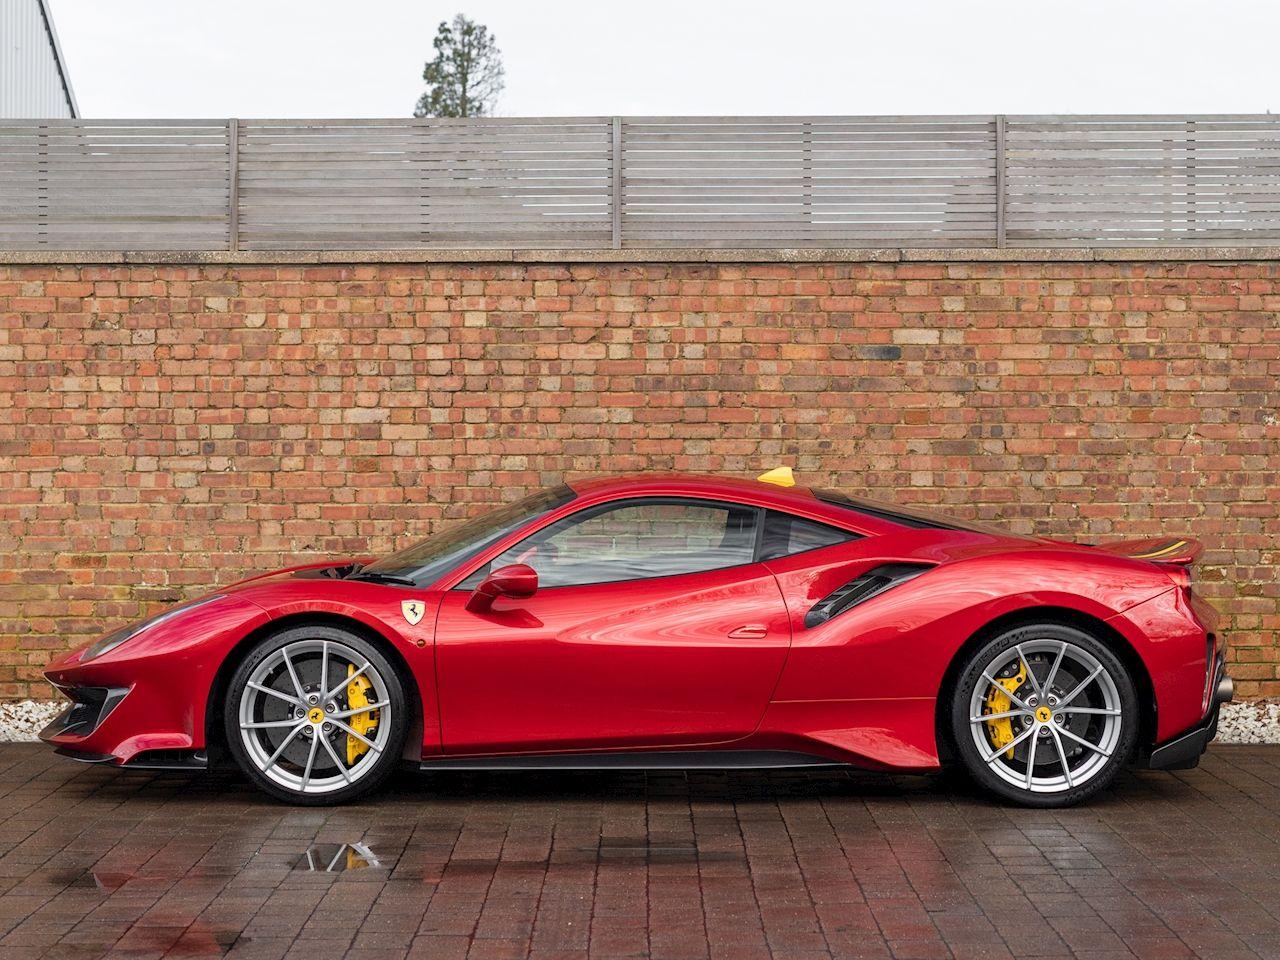 Ferrari 488 Pista Romans International United Kingdom For Sale On Luxurypulse Ferrari 488 Ferrari Super Cars